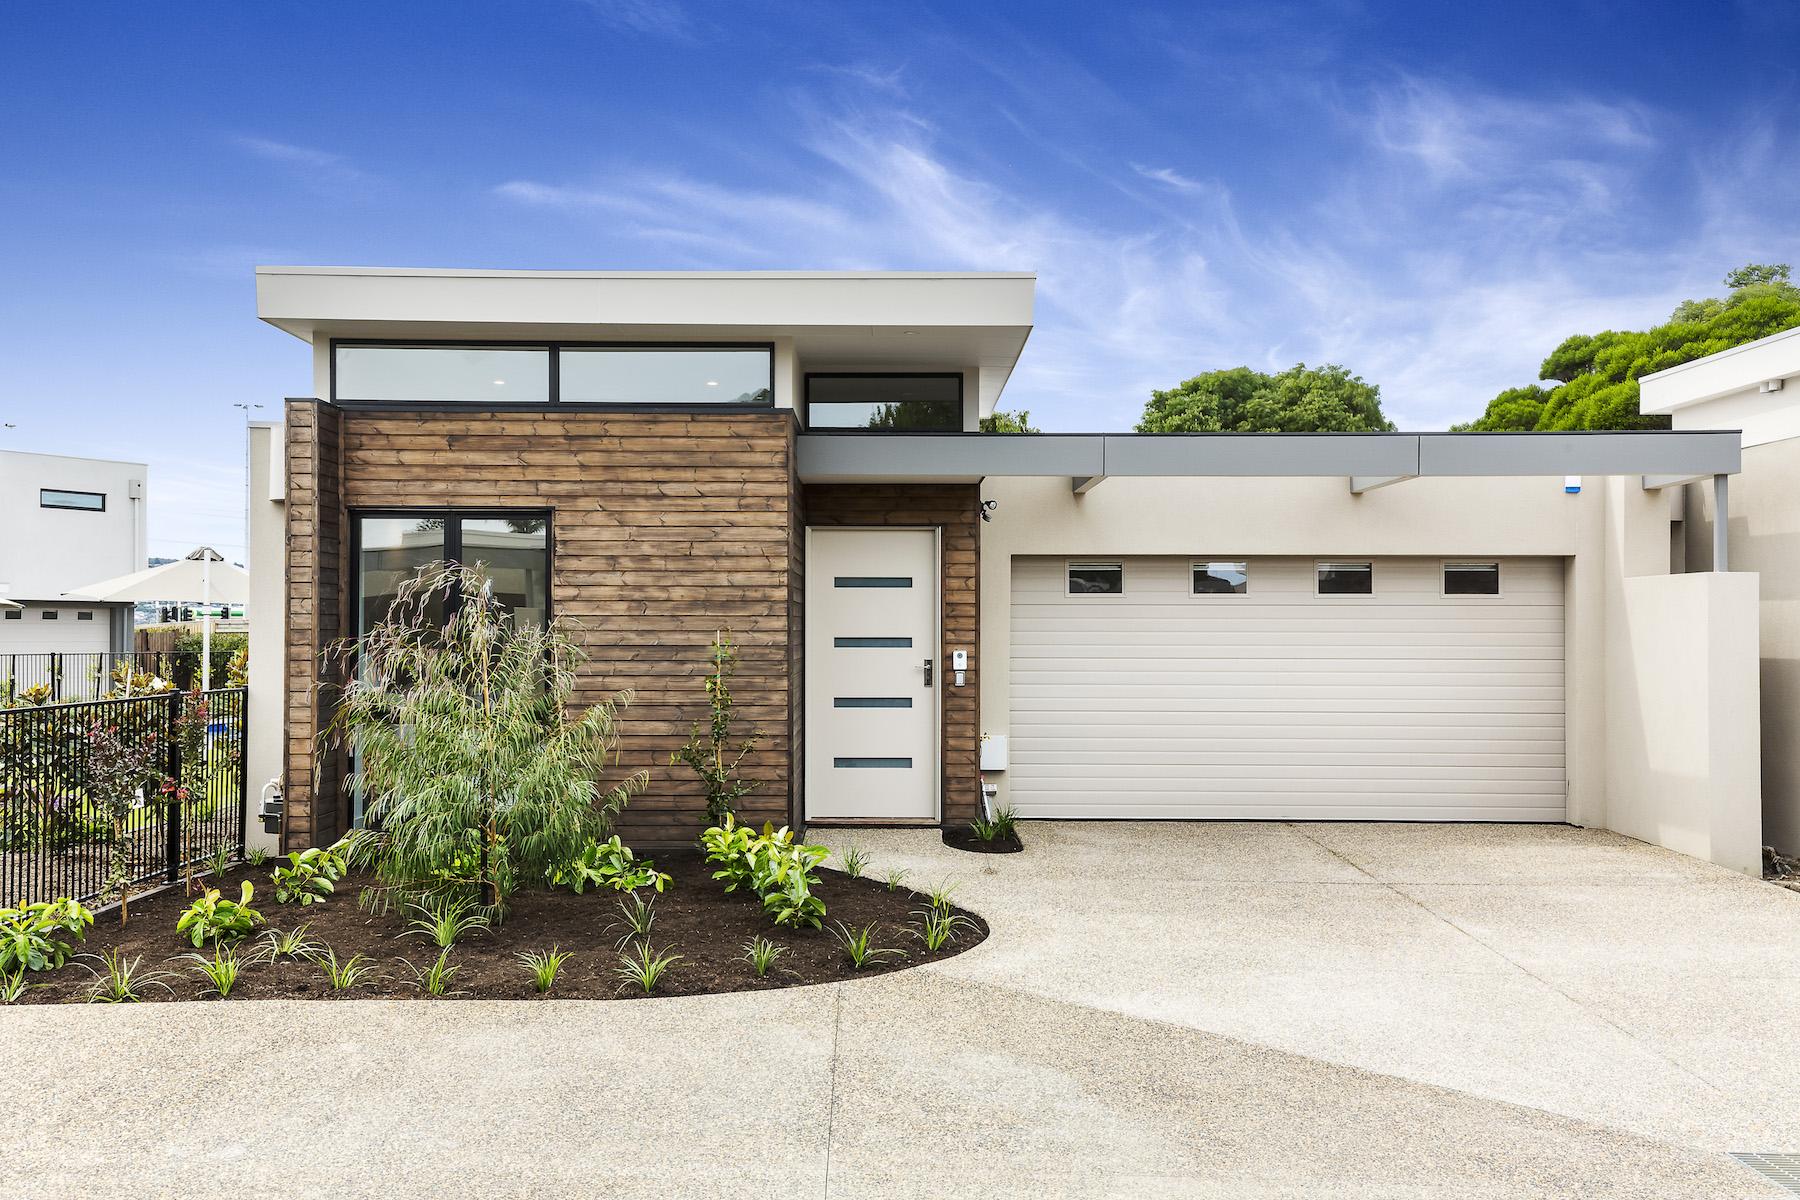 Residência urbana para Venda às 17/2 Point Nepean Road, Dromana Dromana, Victoria, 3936 Austrália